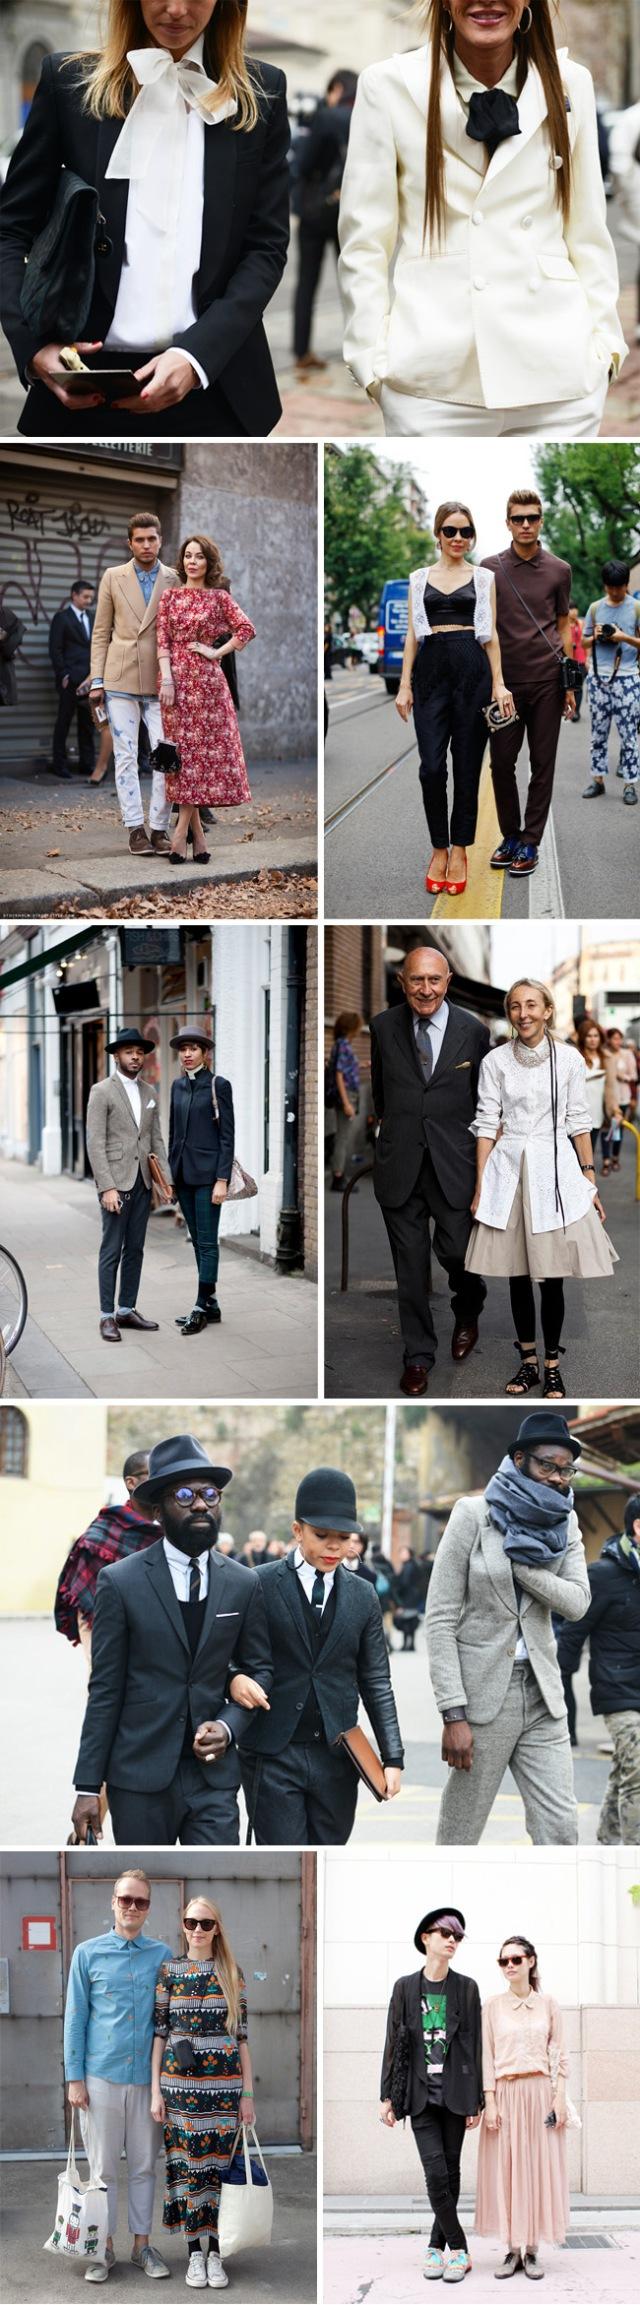 fashionable couples